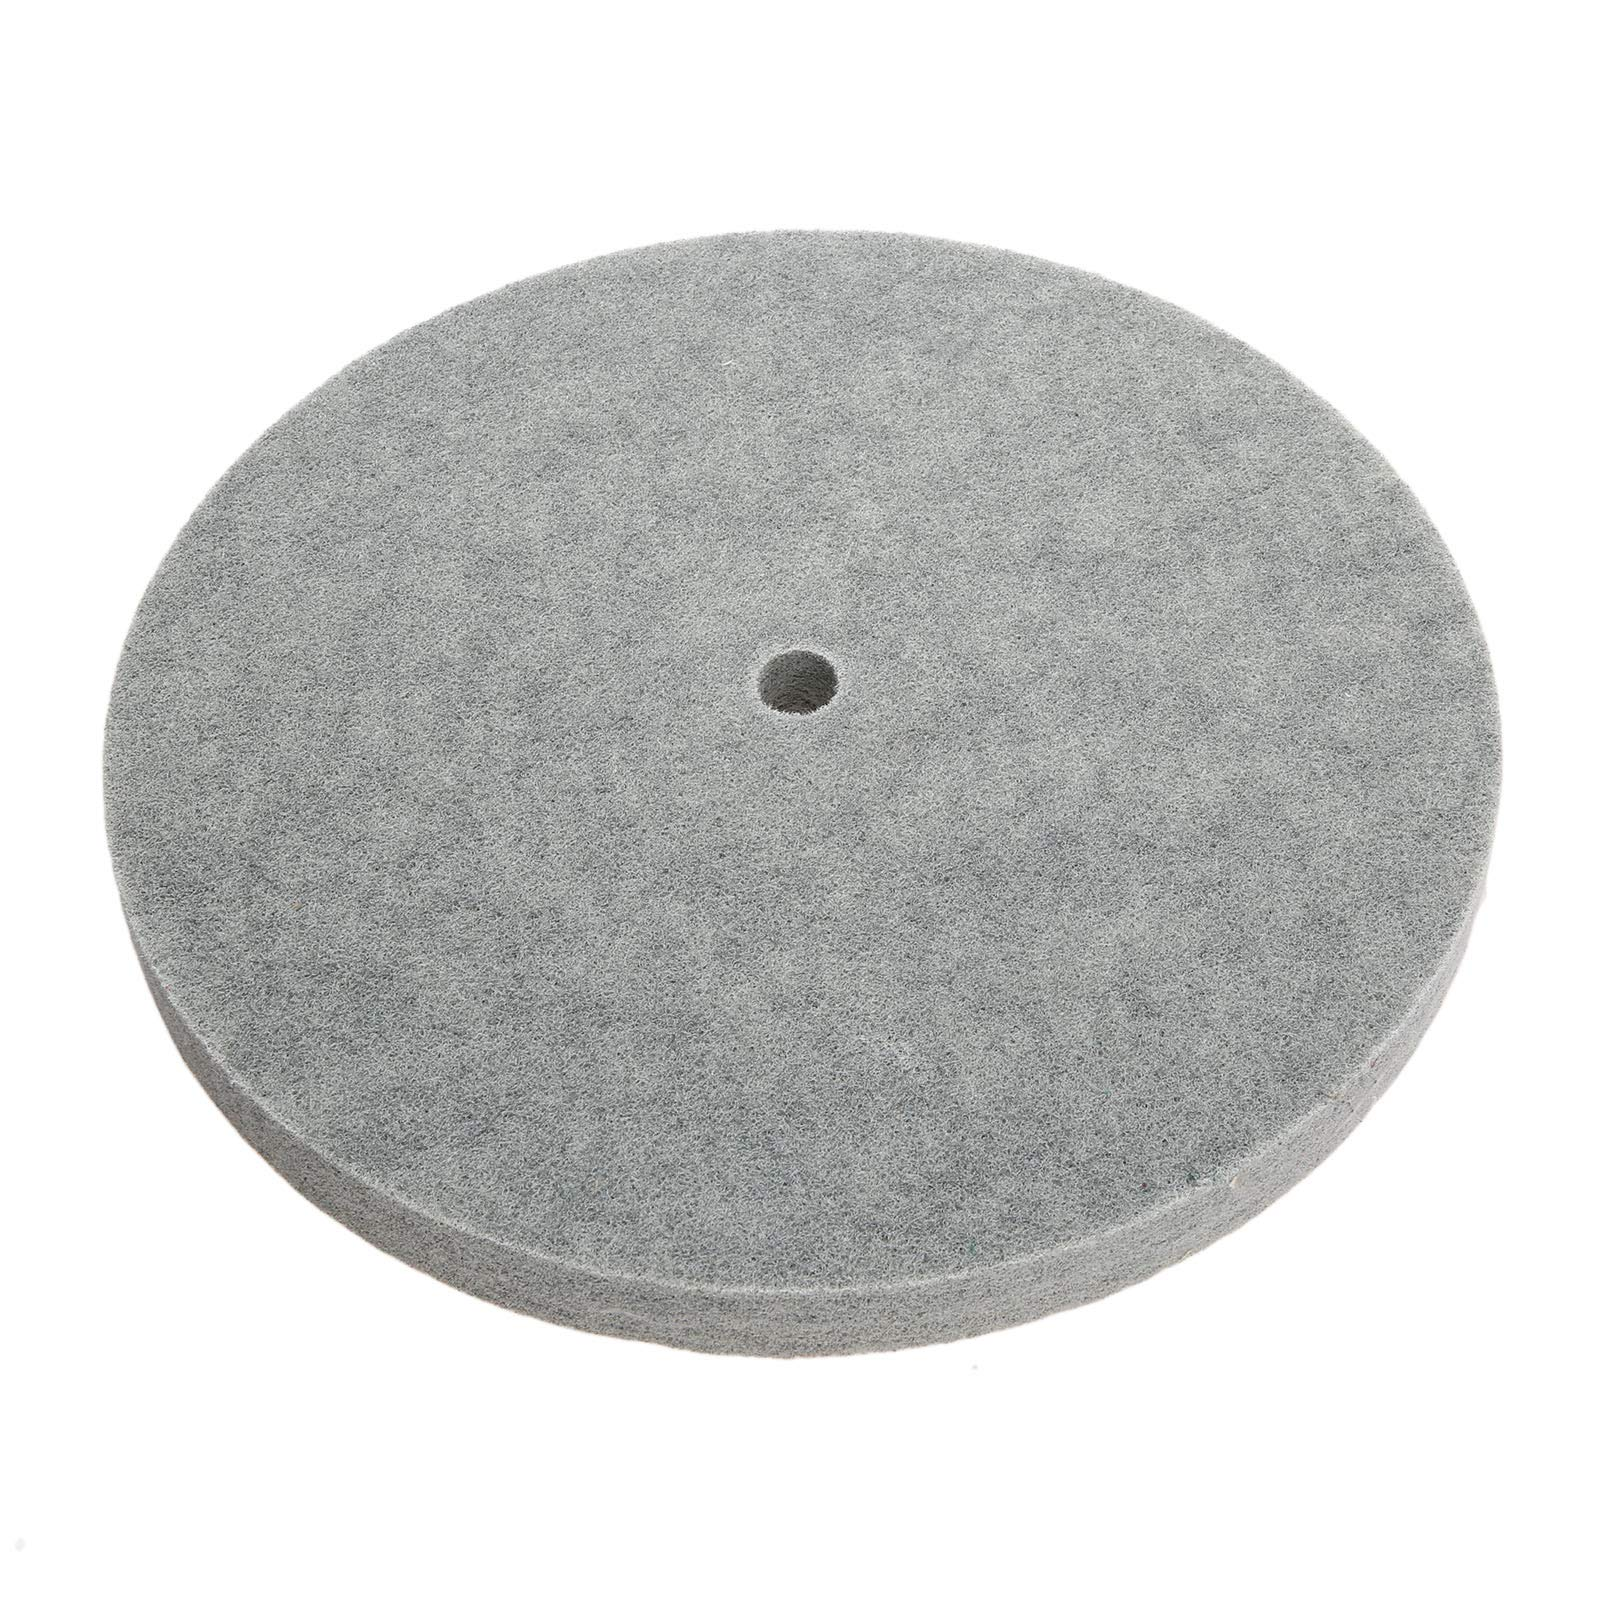 1 PC Thickness Nylon Fiber Polishing Wheel Non-Woven Unitized Wheel 5P 180#, 300MM by Yetaha (Image #1)